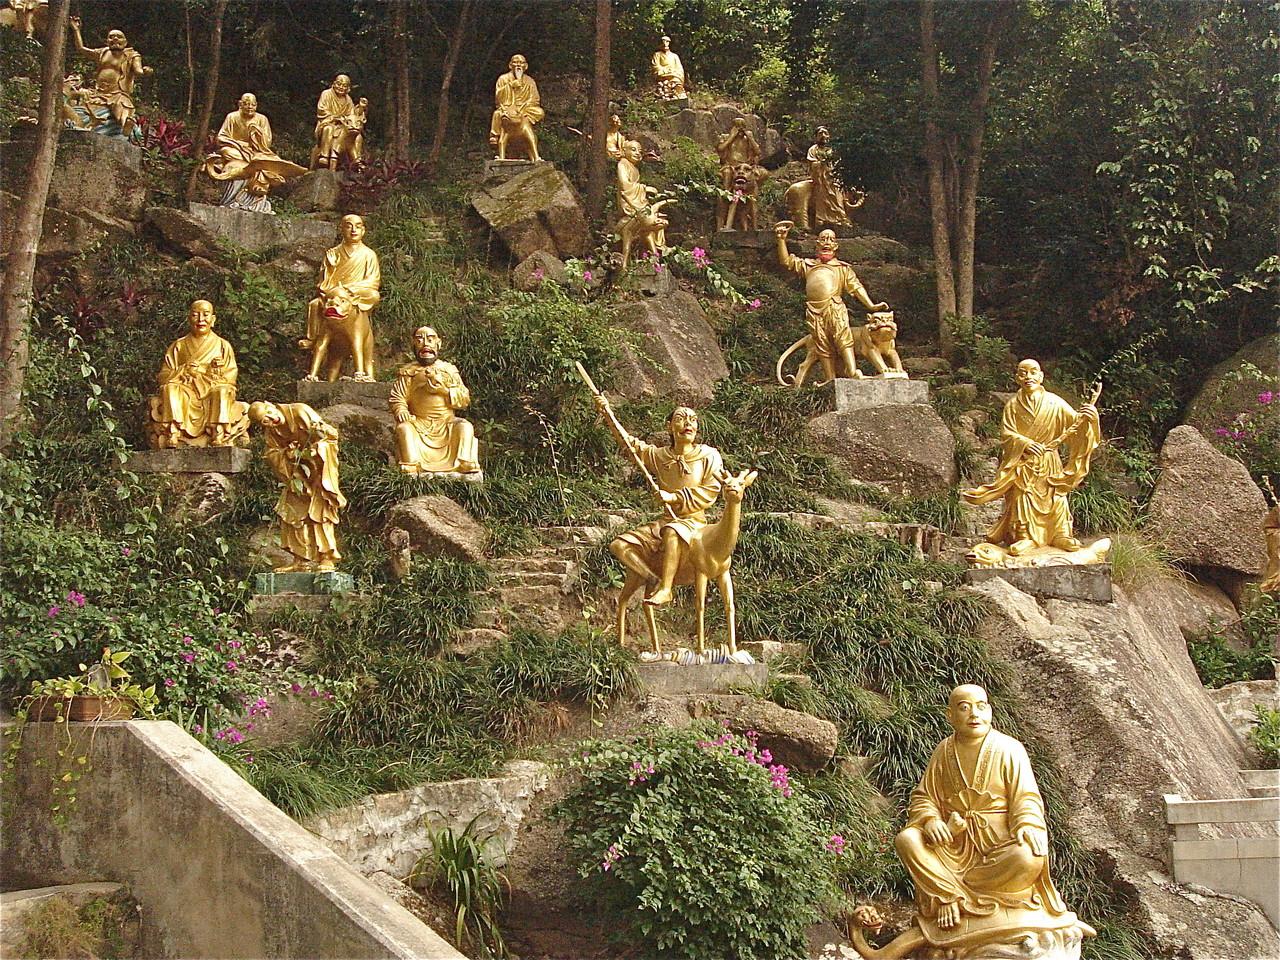 More Buddhas...